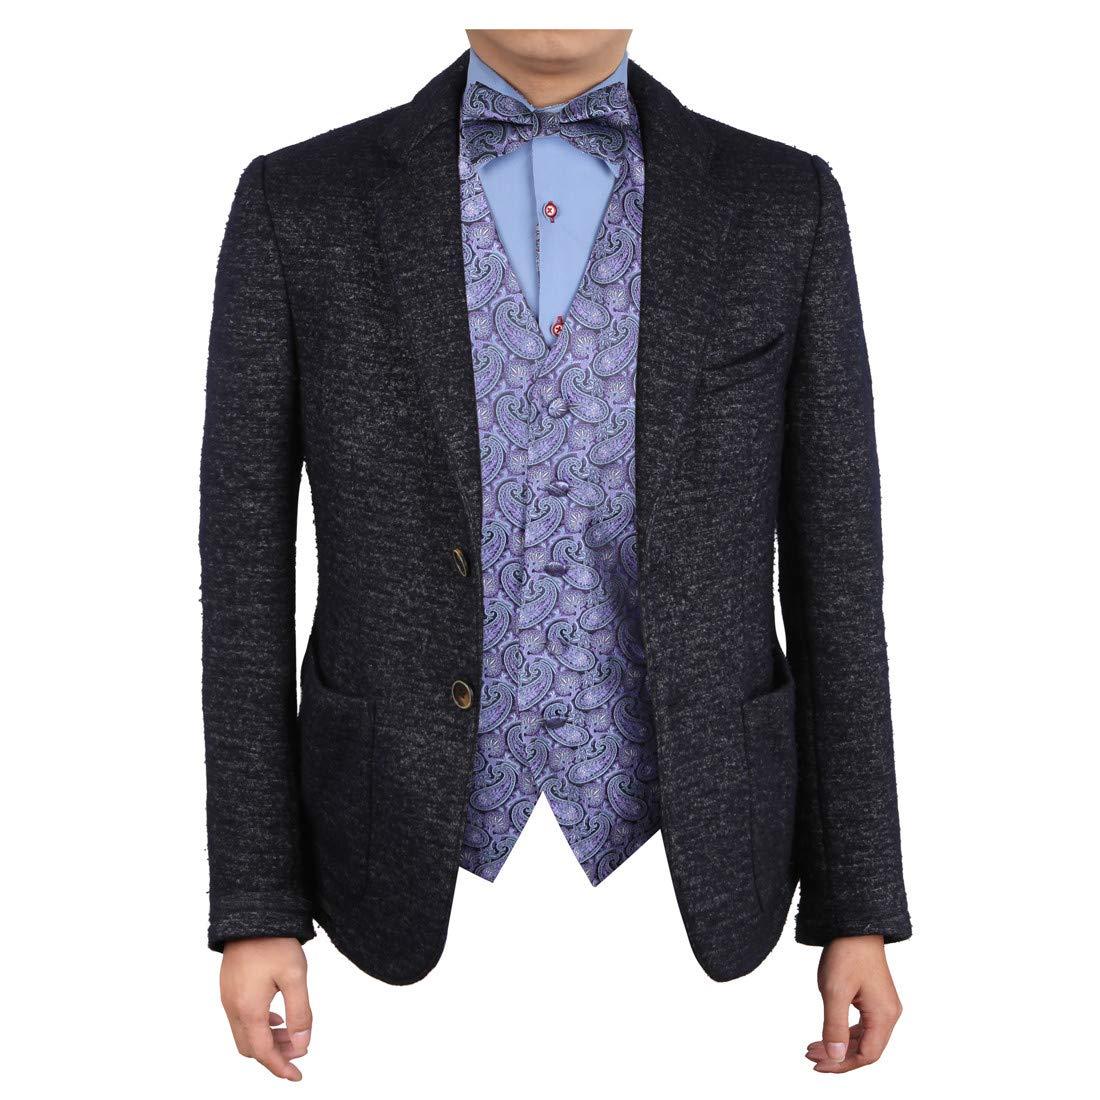 Epoint Mens Fashion Exporters Waistcoat Paisley Microfiber Vest Pre-tied Bow Tie